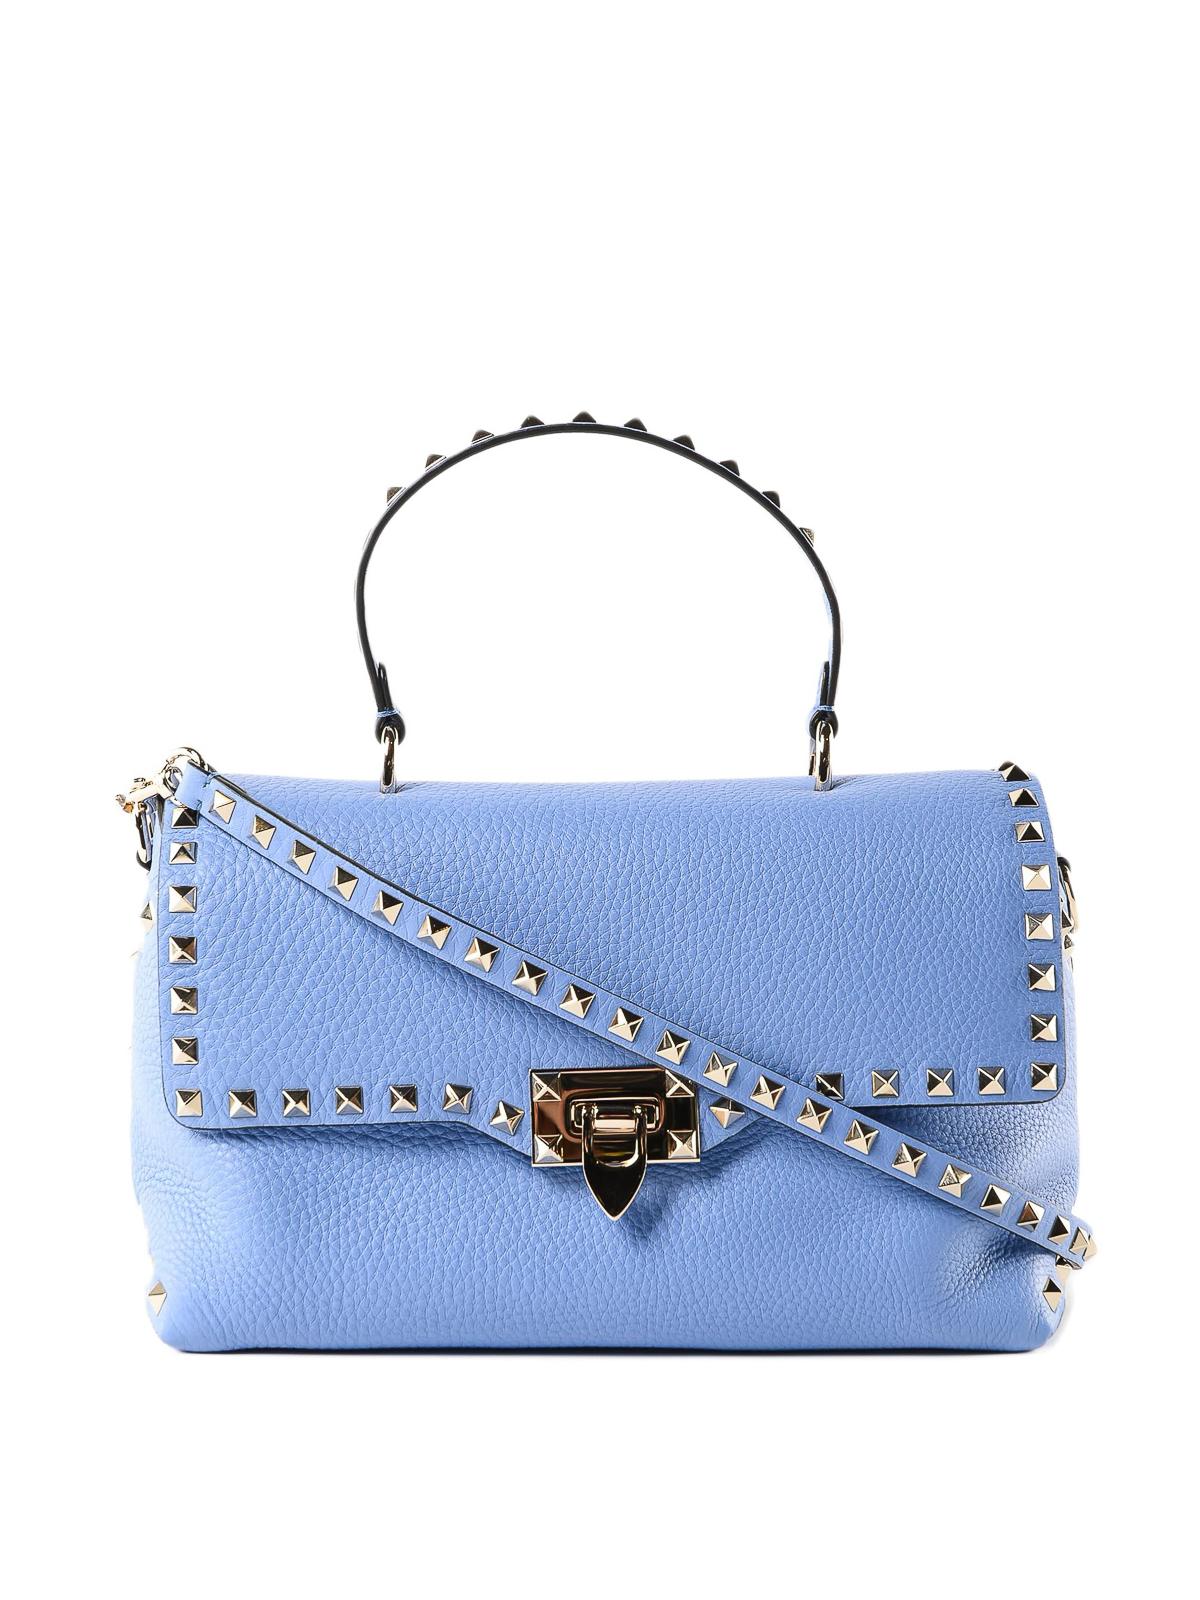 Valentino Garavani - Rockstud sky blue leather tote bag - totes bags ... 47a4950e25